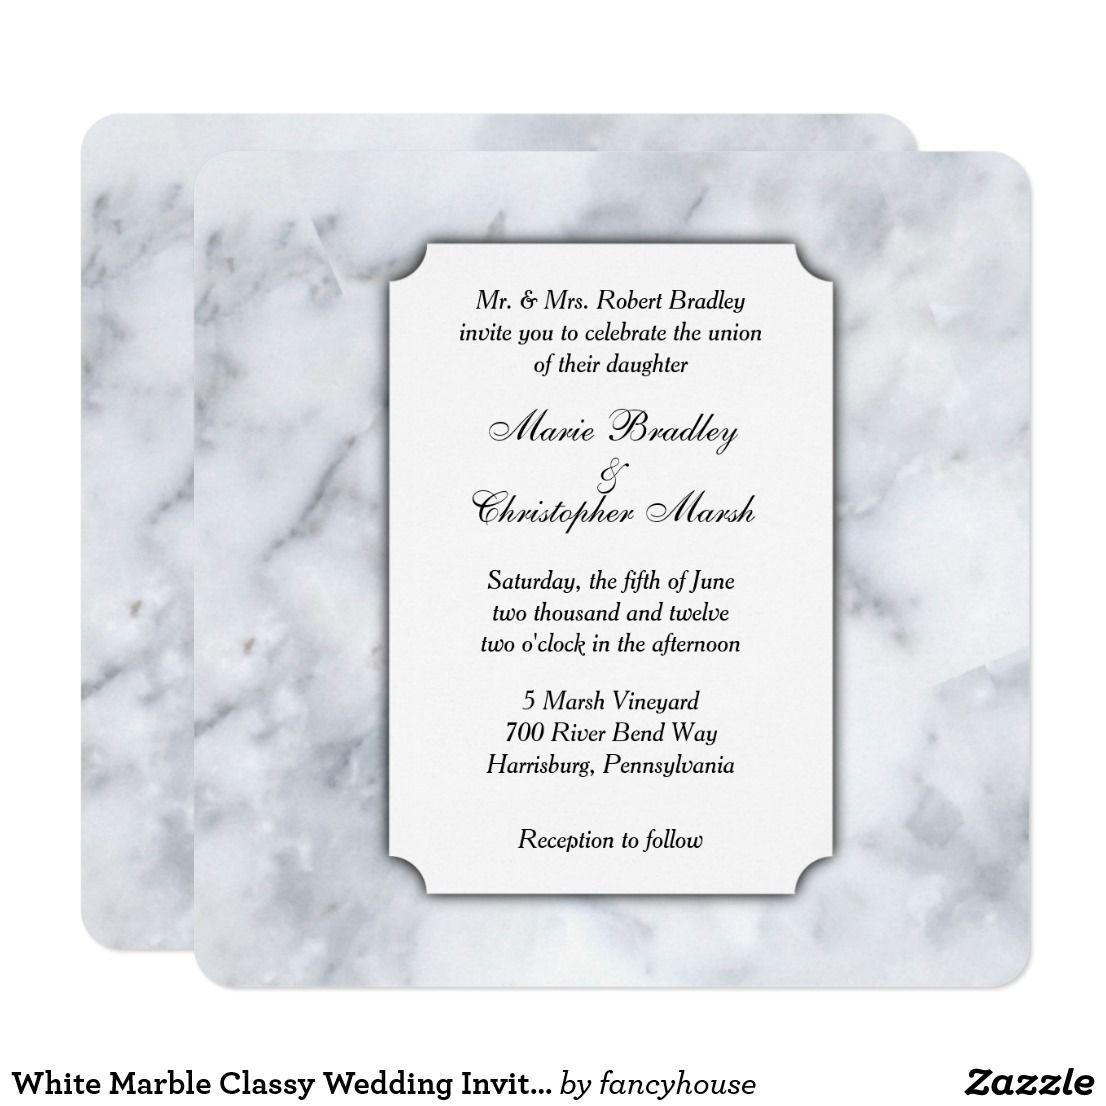 White Marble Classy Wedding Invitation | Wedding